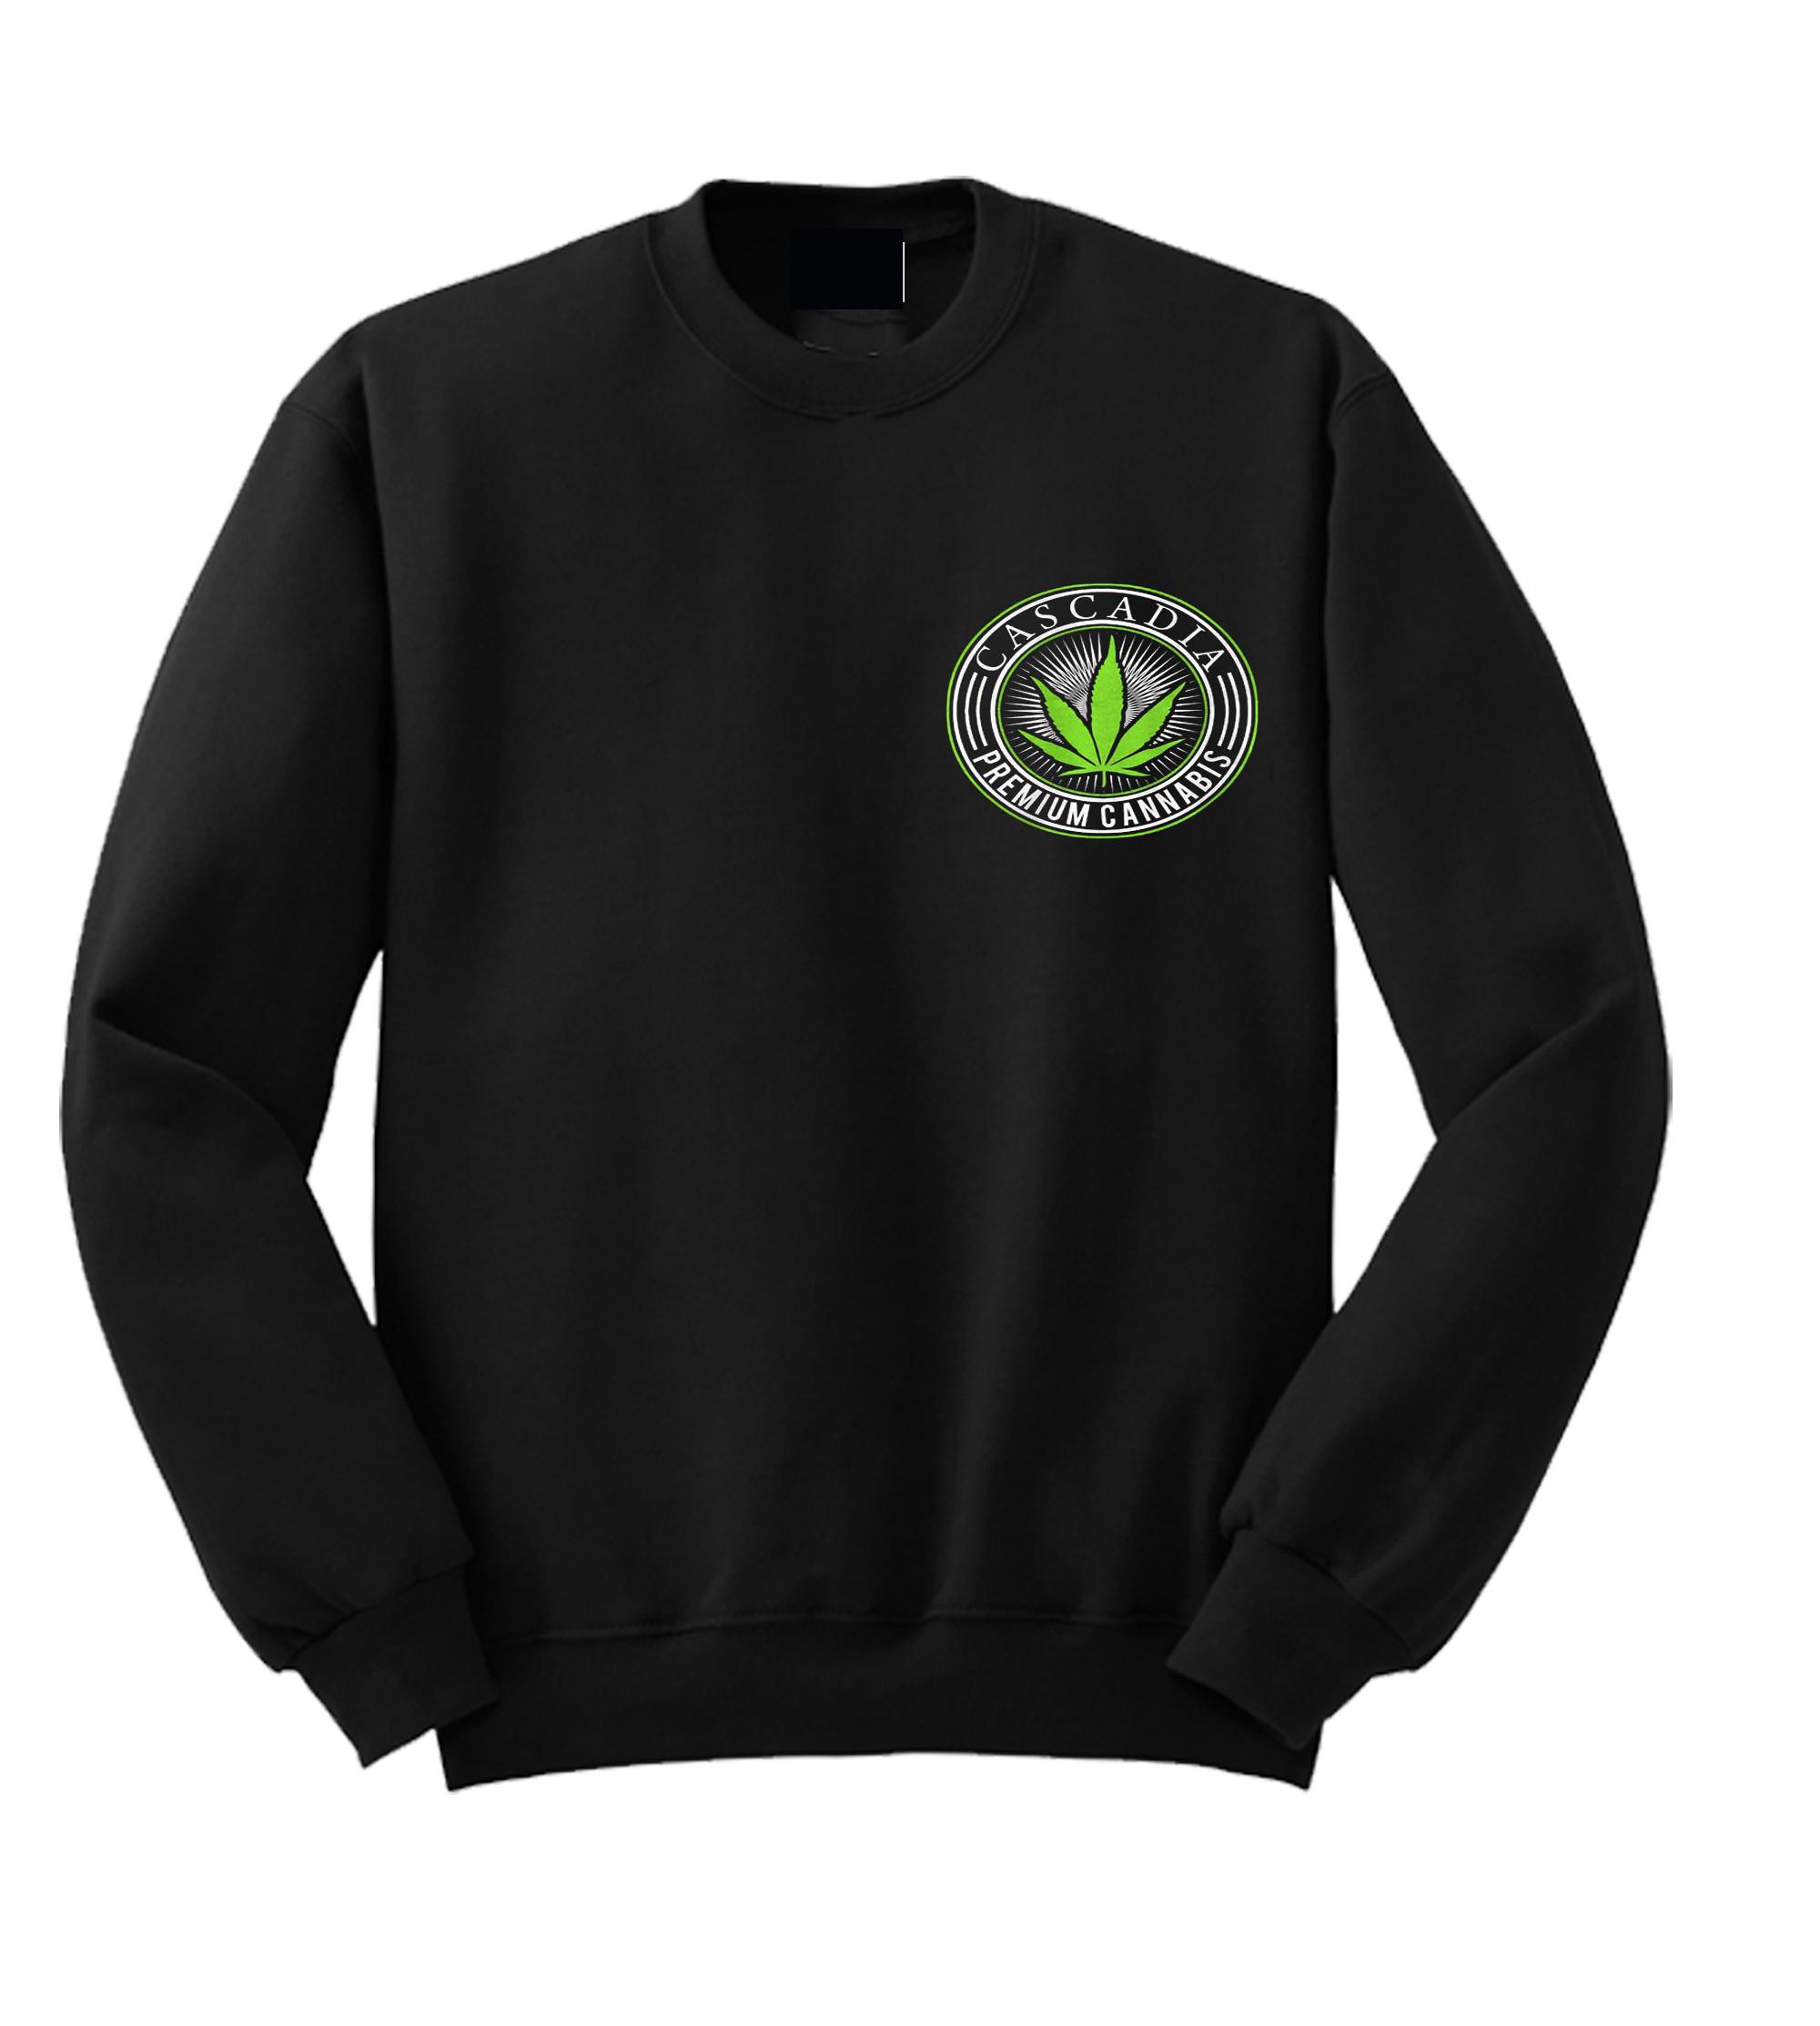 Cascadia Premium Cannabis Sweatshirt